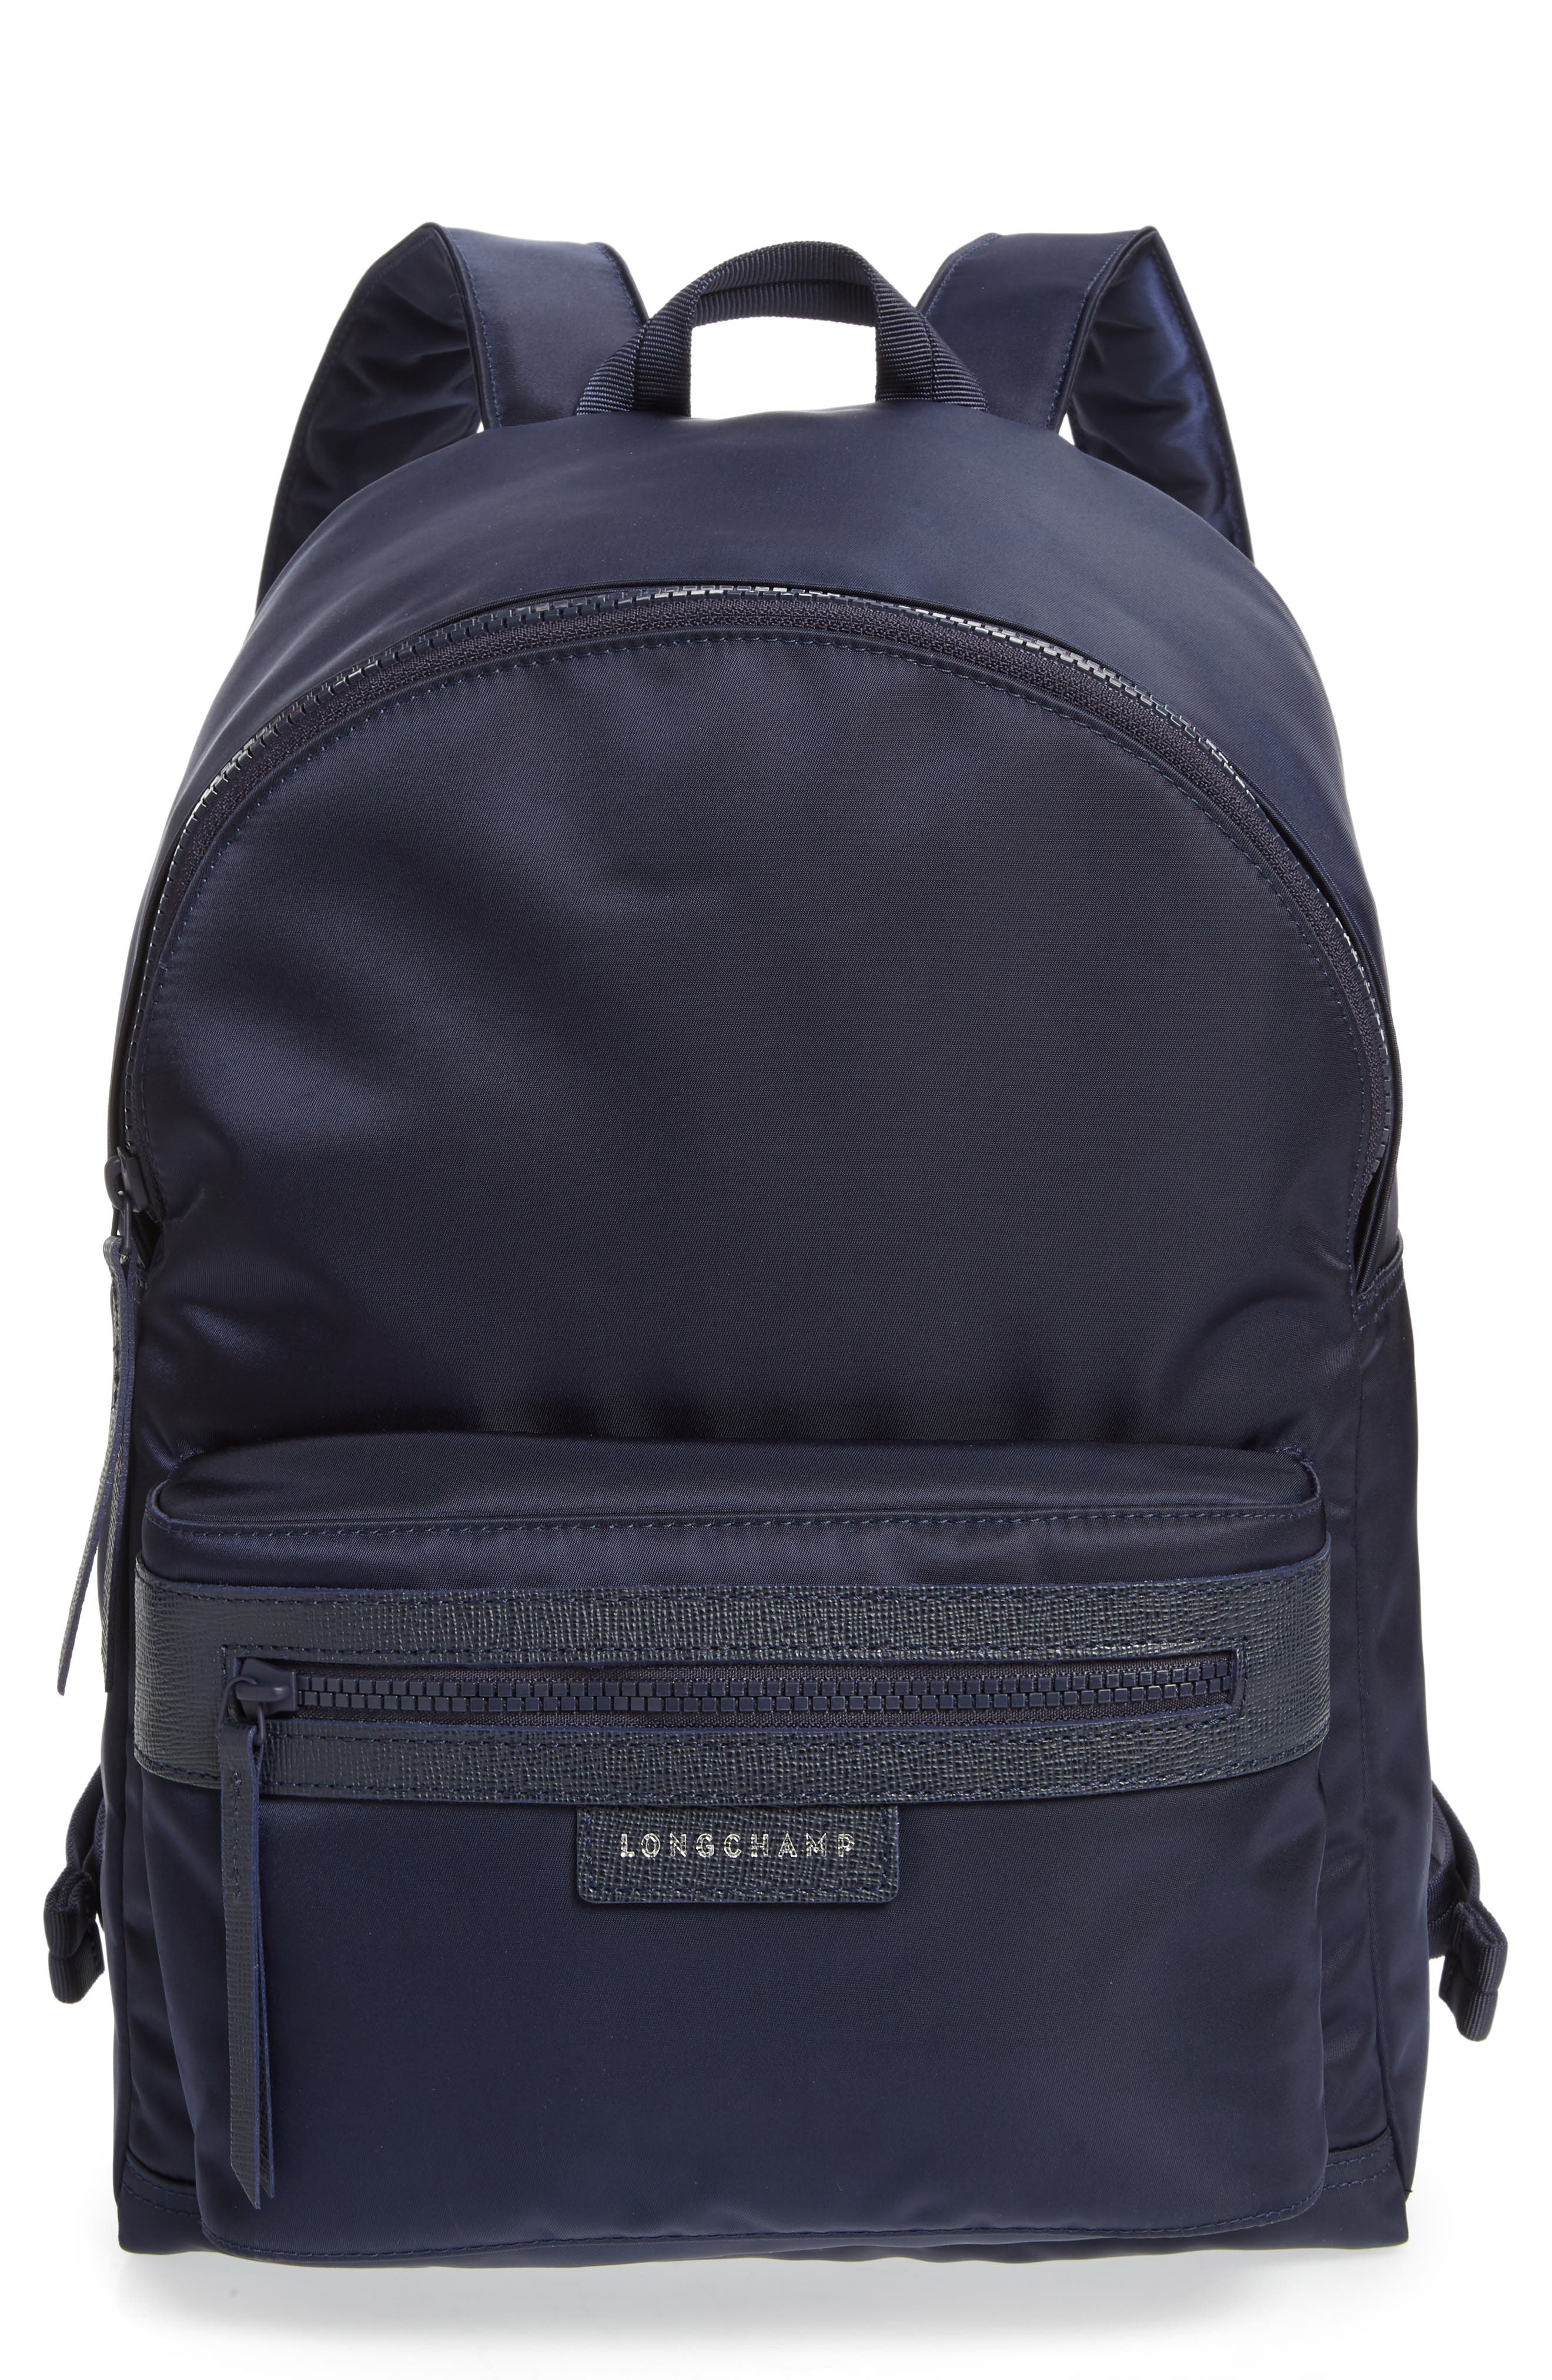 'Le Pliage Neo' Nylon Backpack,                         Main,                         color, Navy Blue